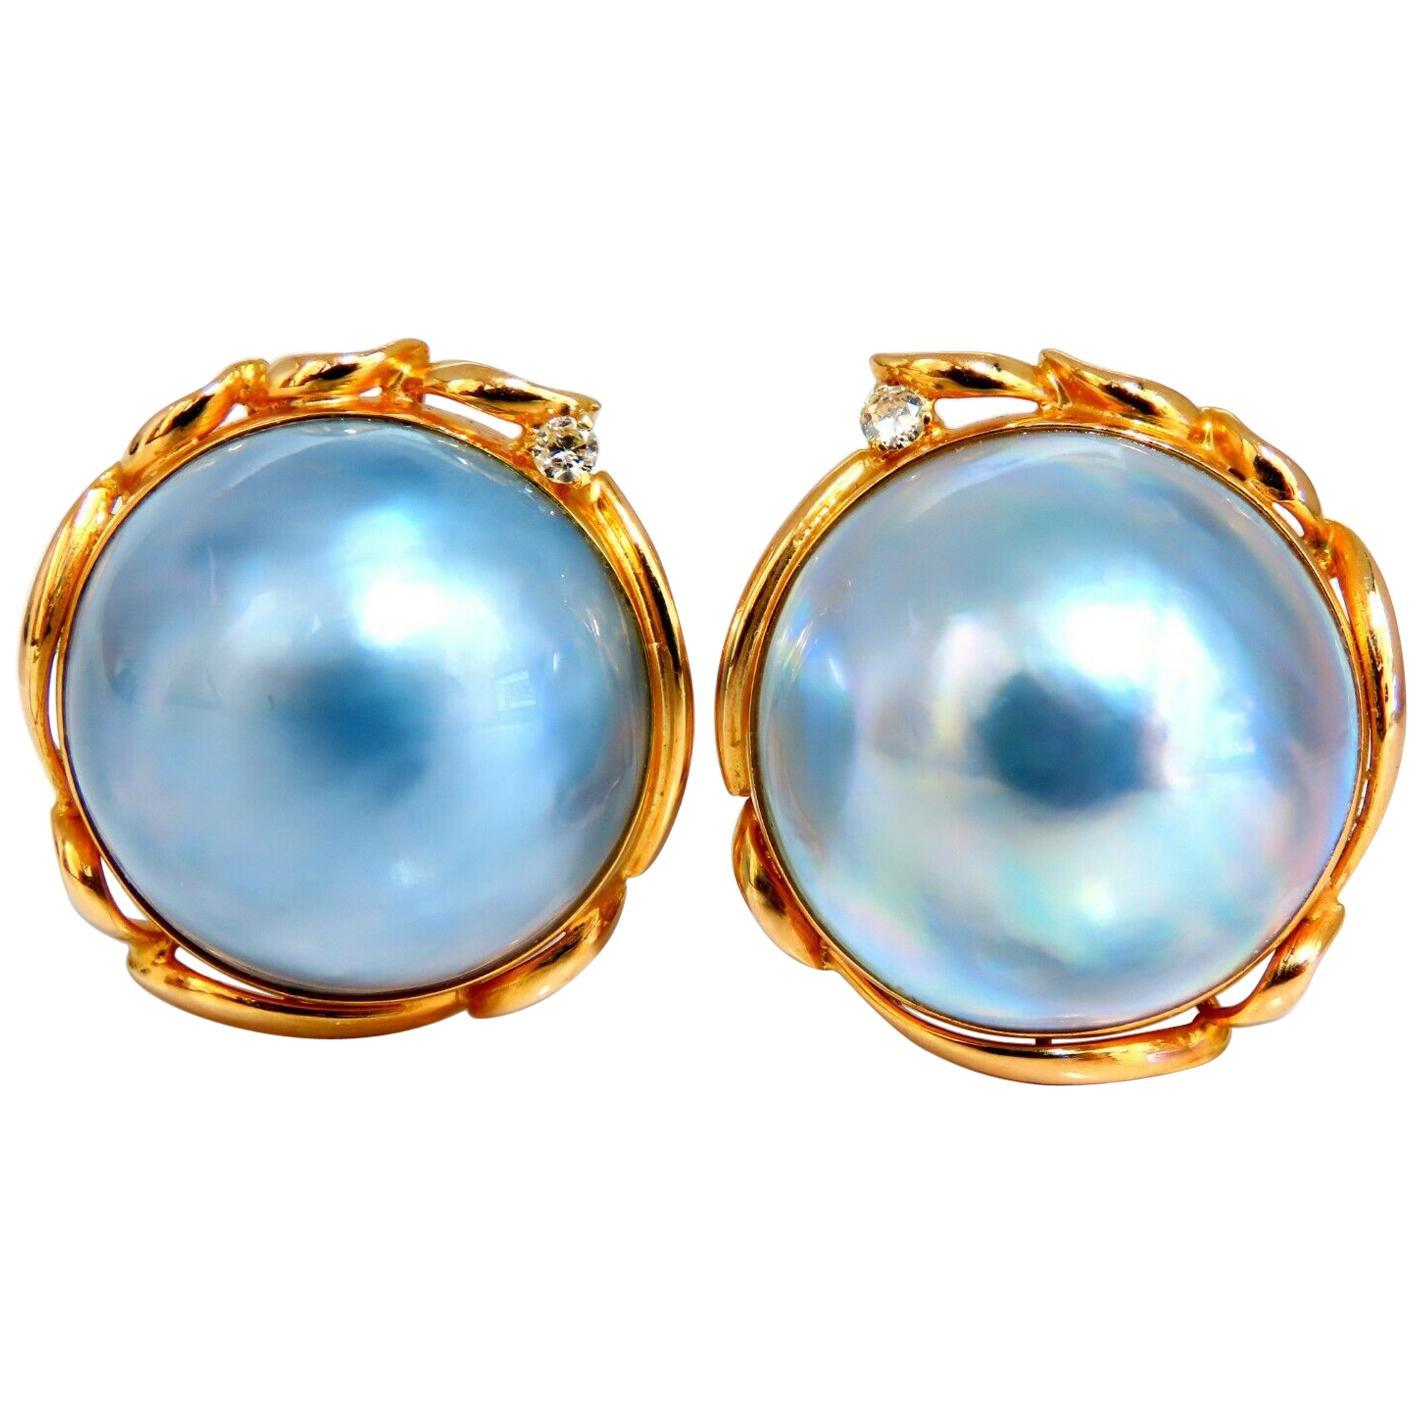 14 Karat Mabe Pearl Clip Earrings Shade Gray Blue